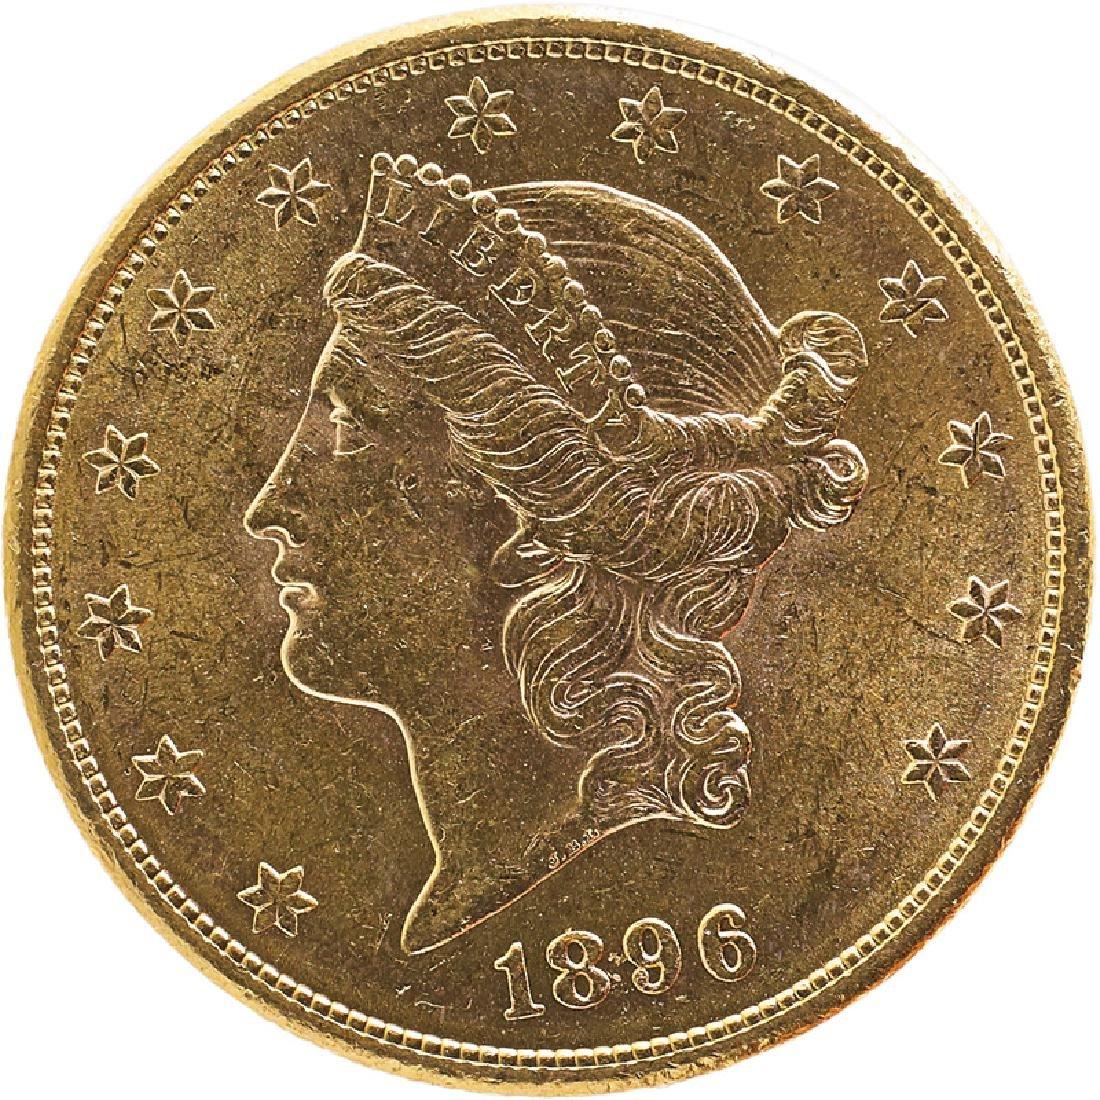 U.S. 1896-S LIBERTY $20 GOLD COIN